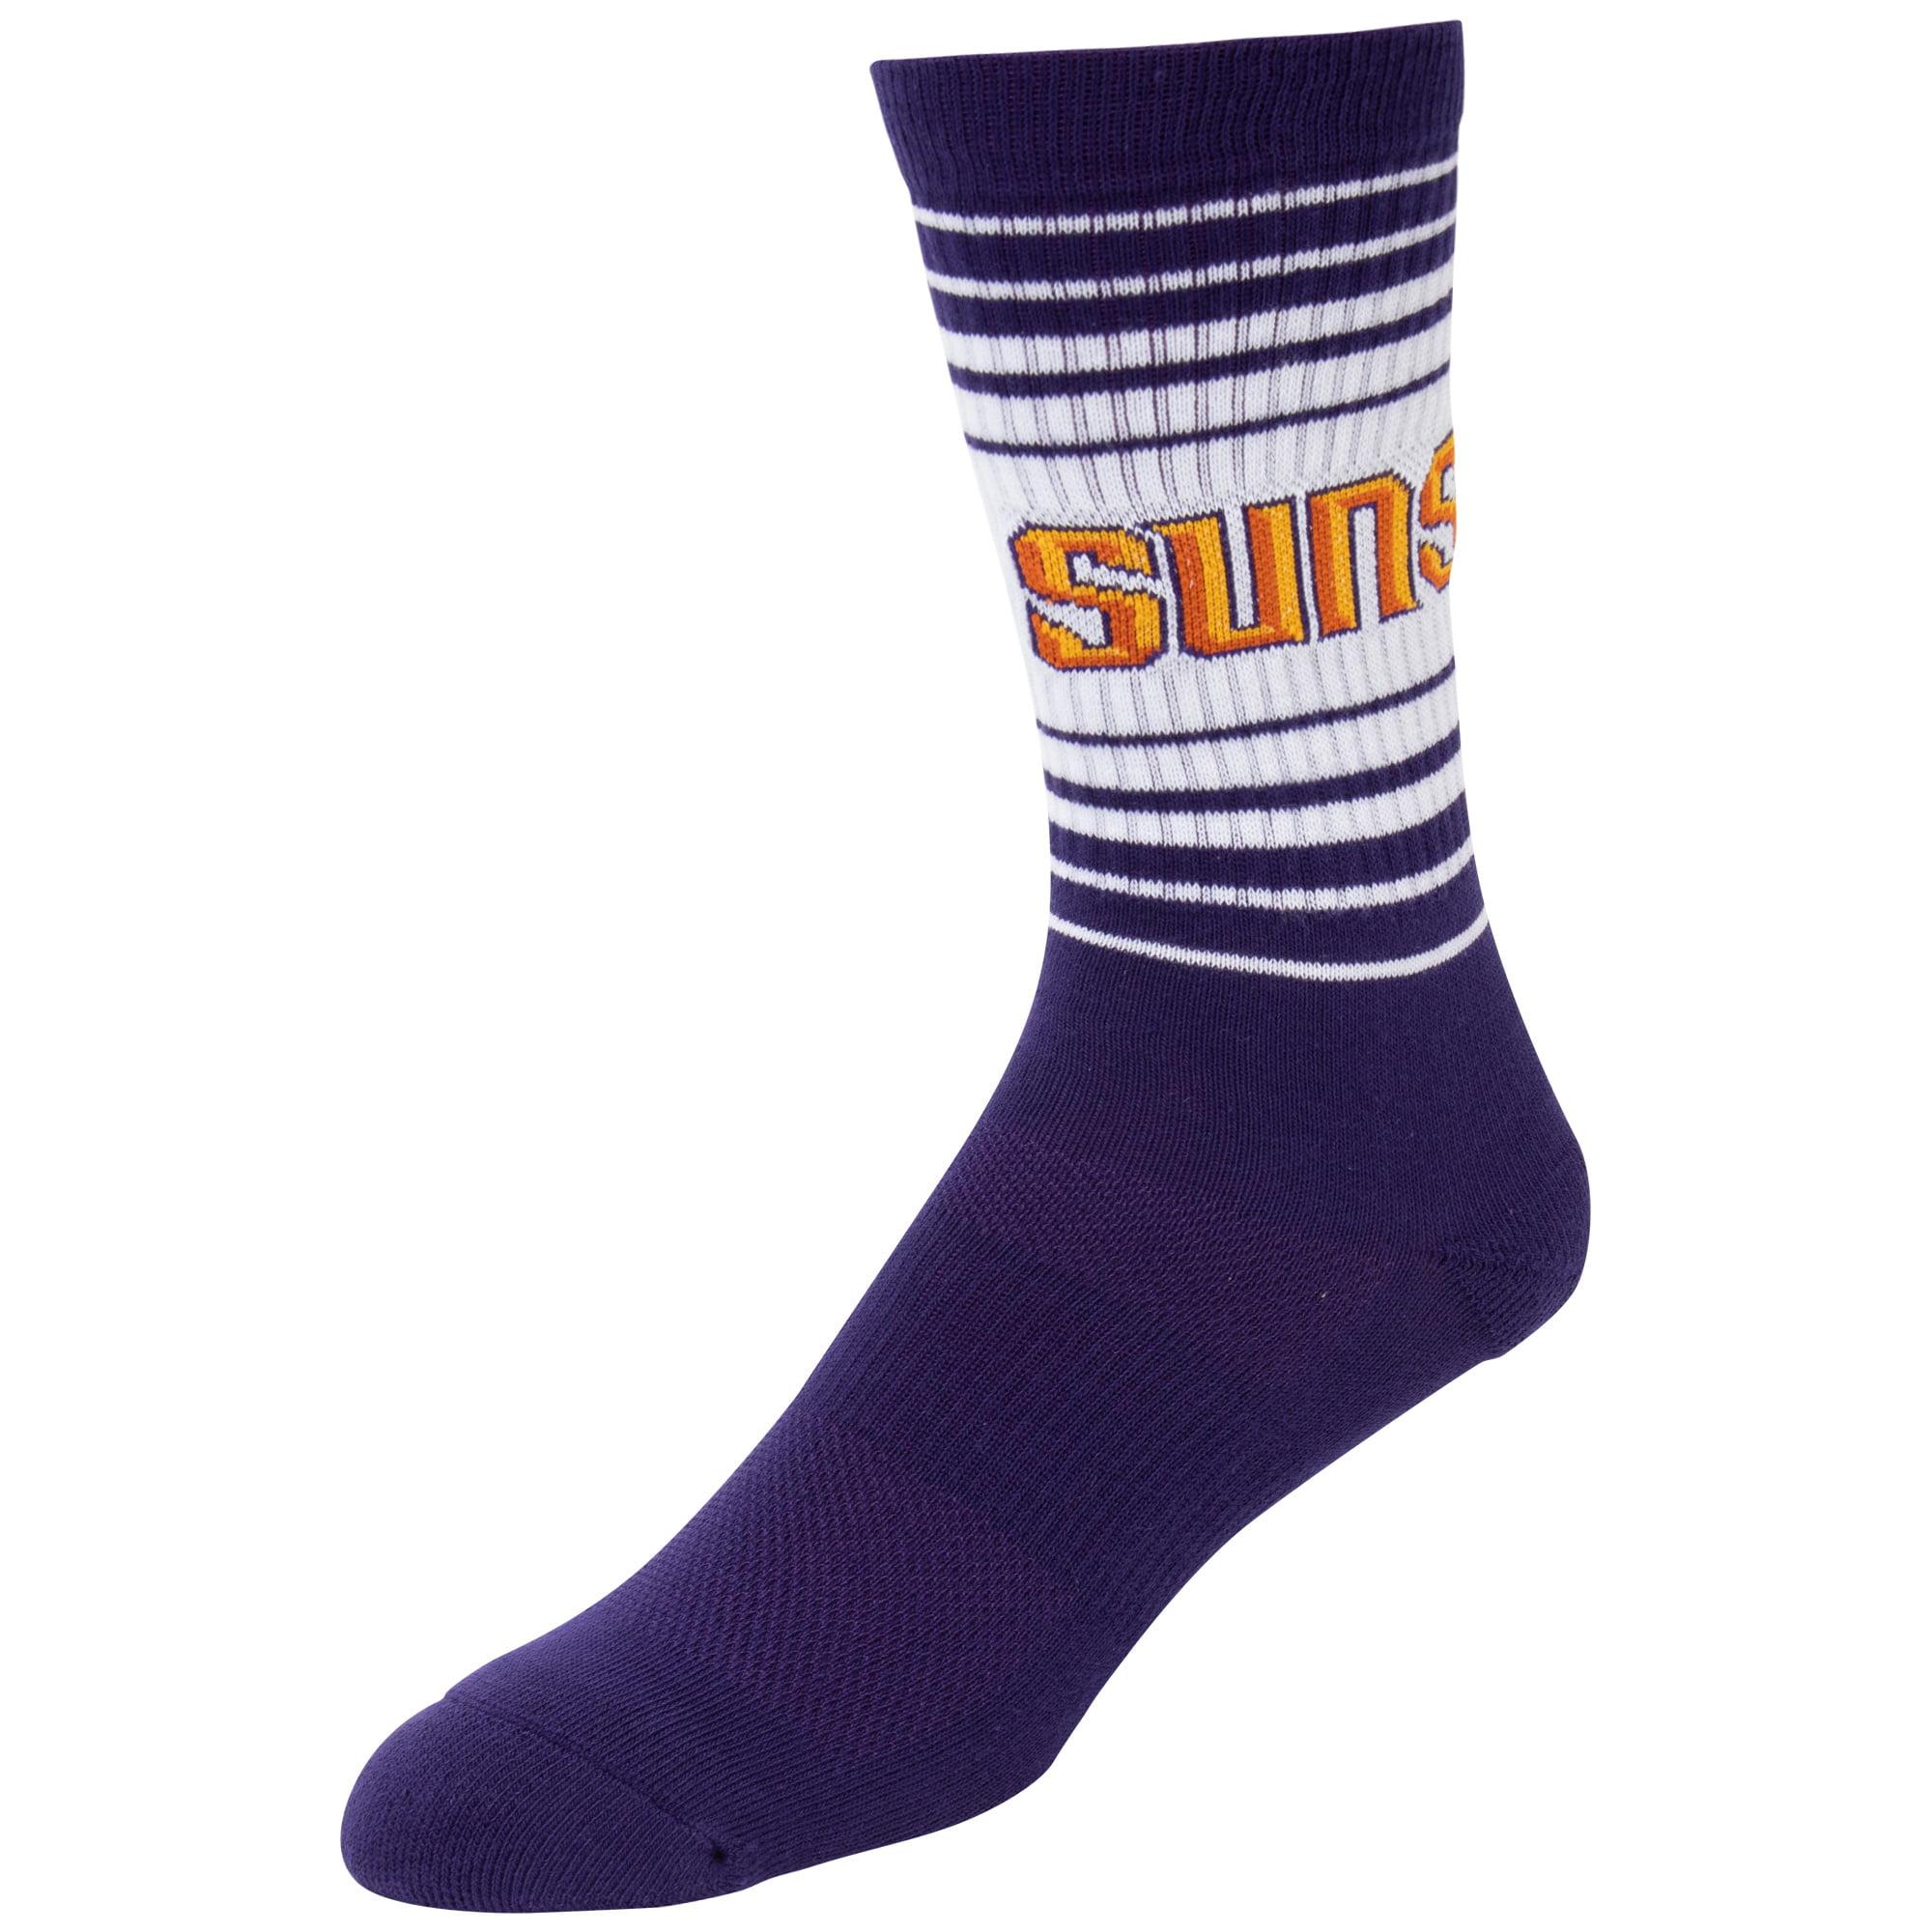 Phoenix Suns Horizon Crew Socks - L